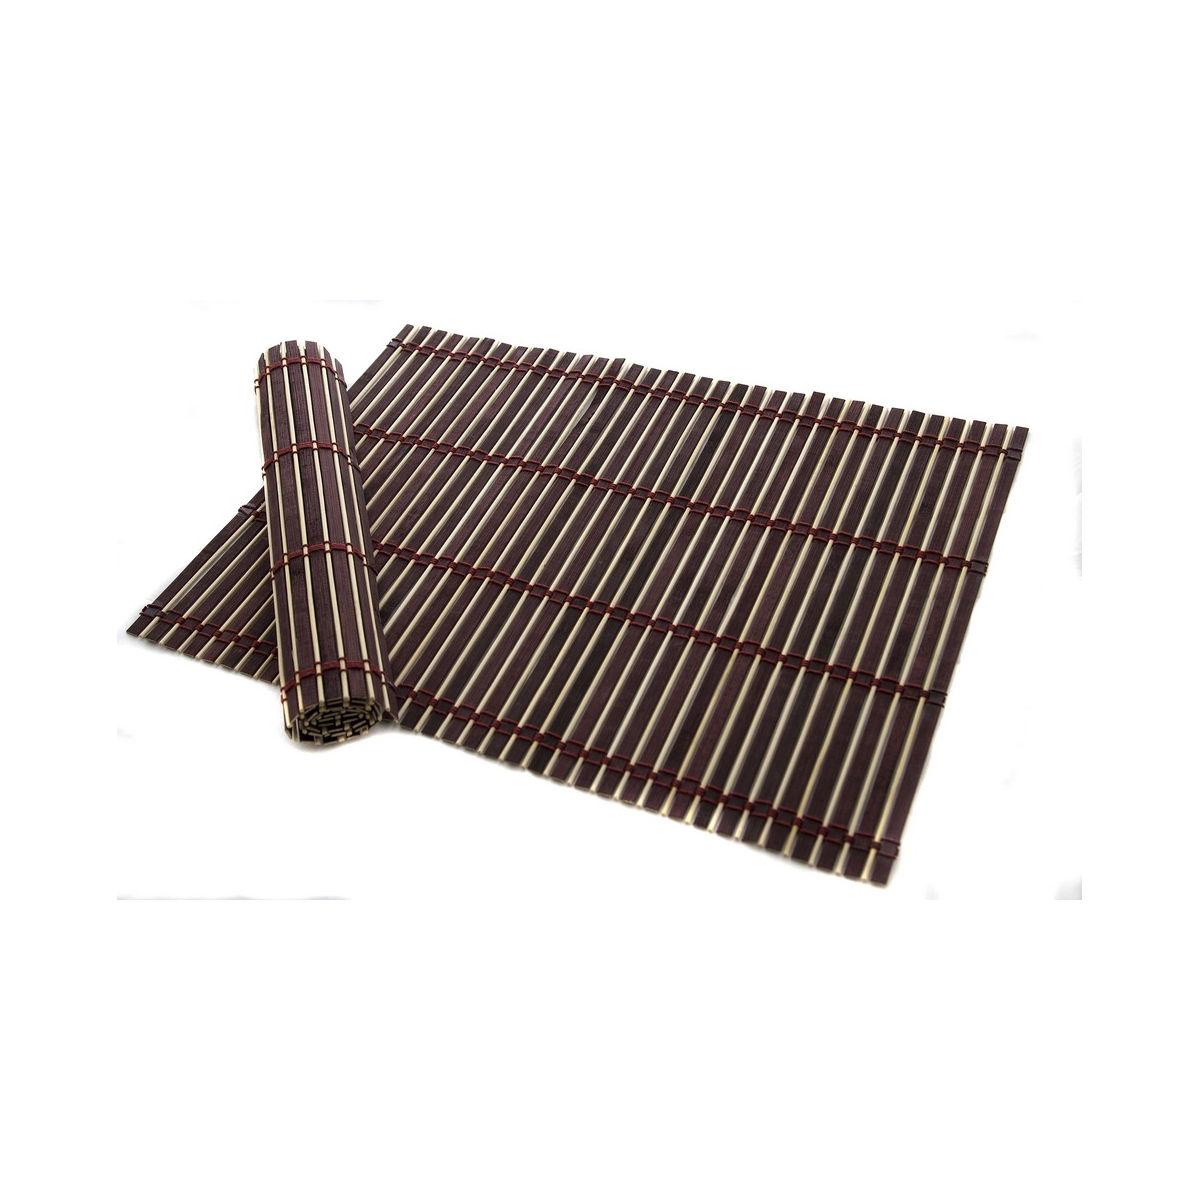 Poza Set 2 suporturi farfurie bambus 45*30 cm